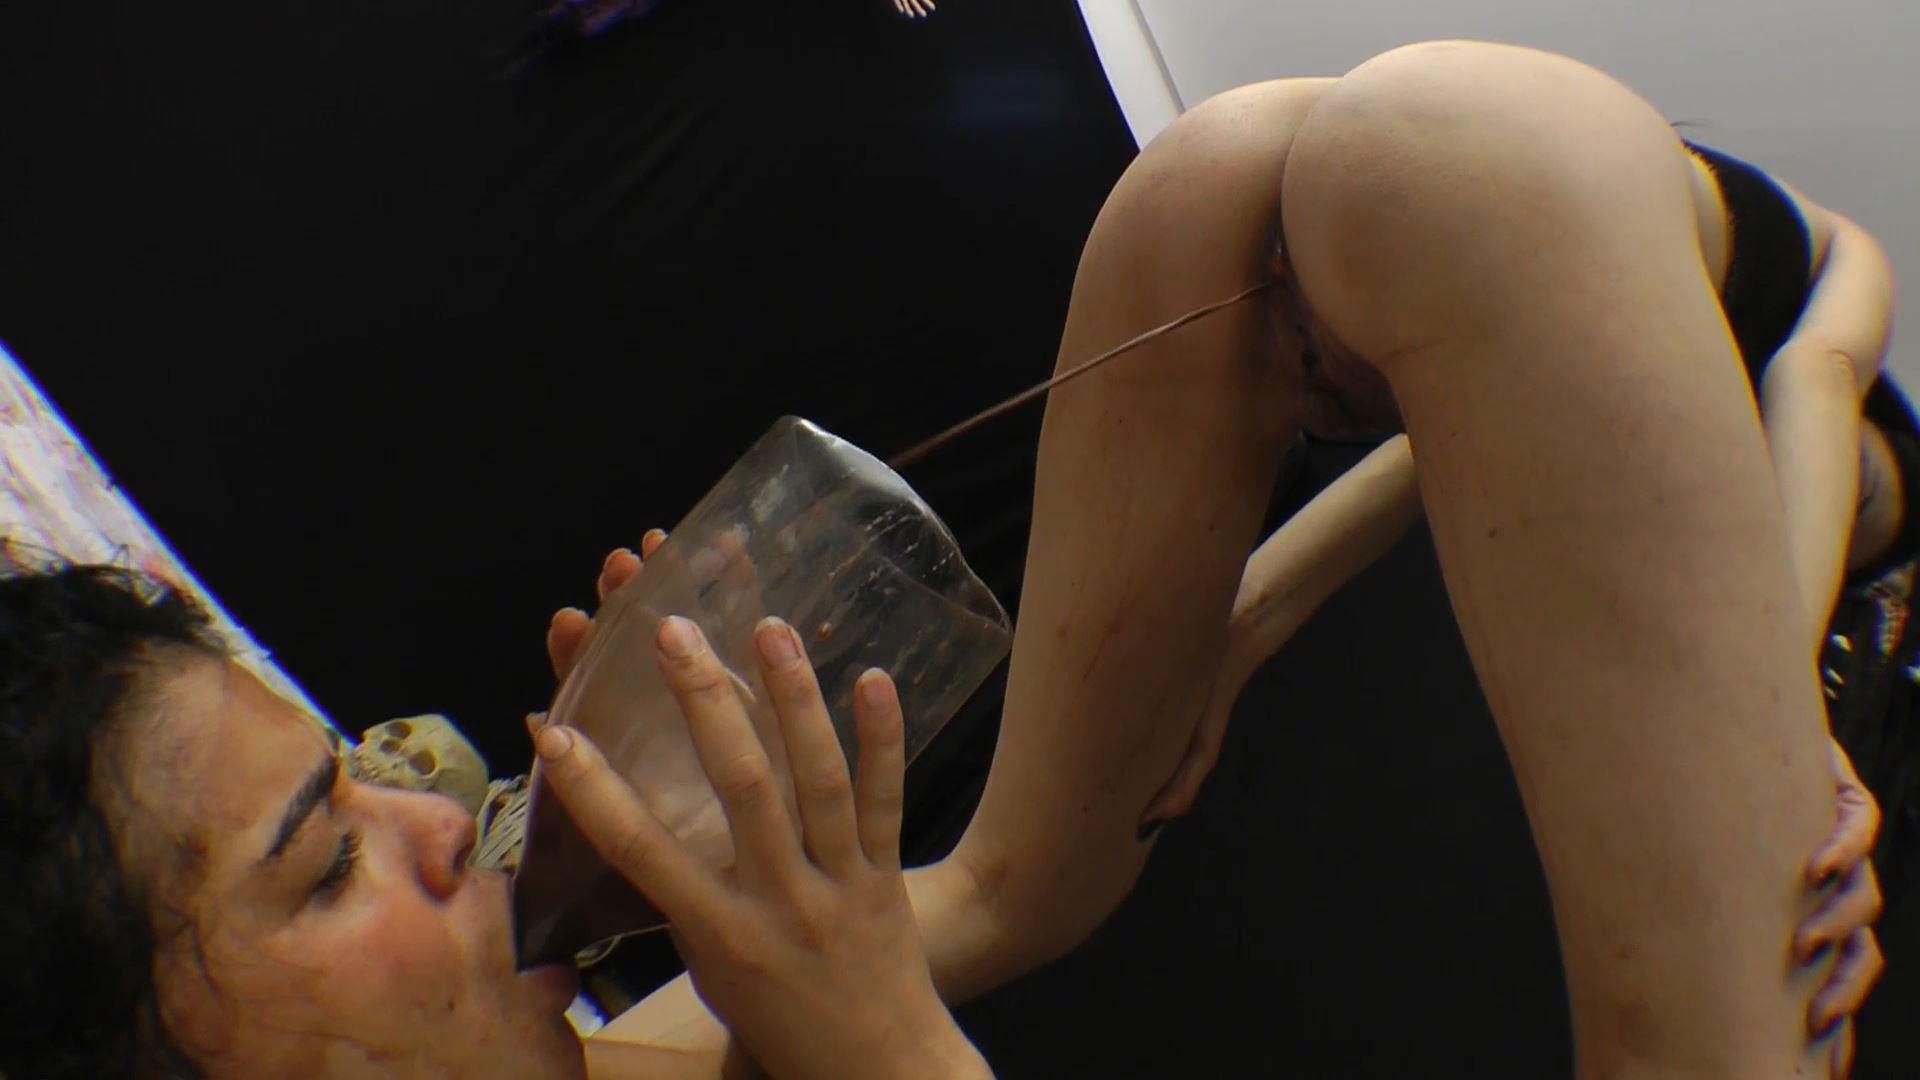 [ENEMA / SG-VIDEO] Facesitting - Enema Diarrhea X-tra Dirty by Brutal Karina Cruel [FULL HD][1080p][MP4]